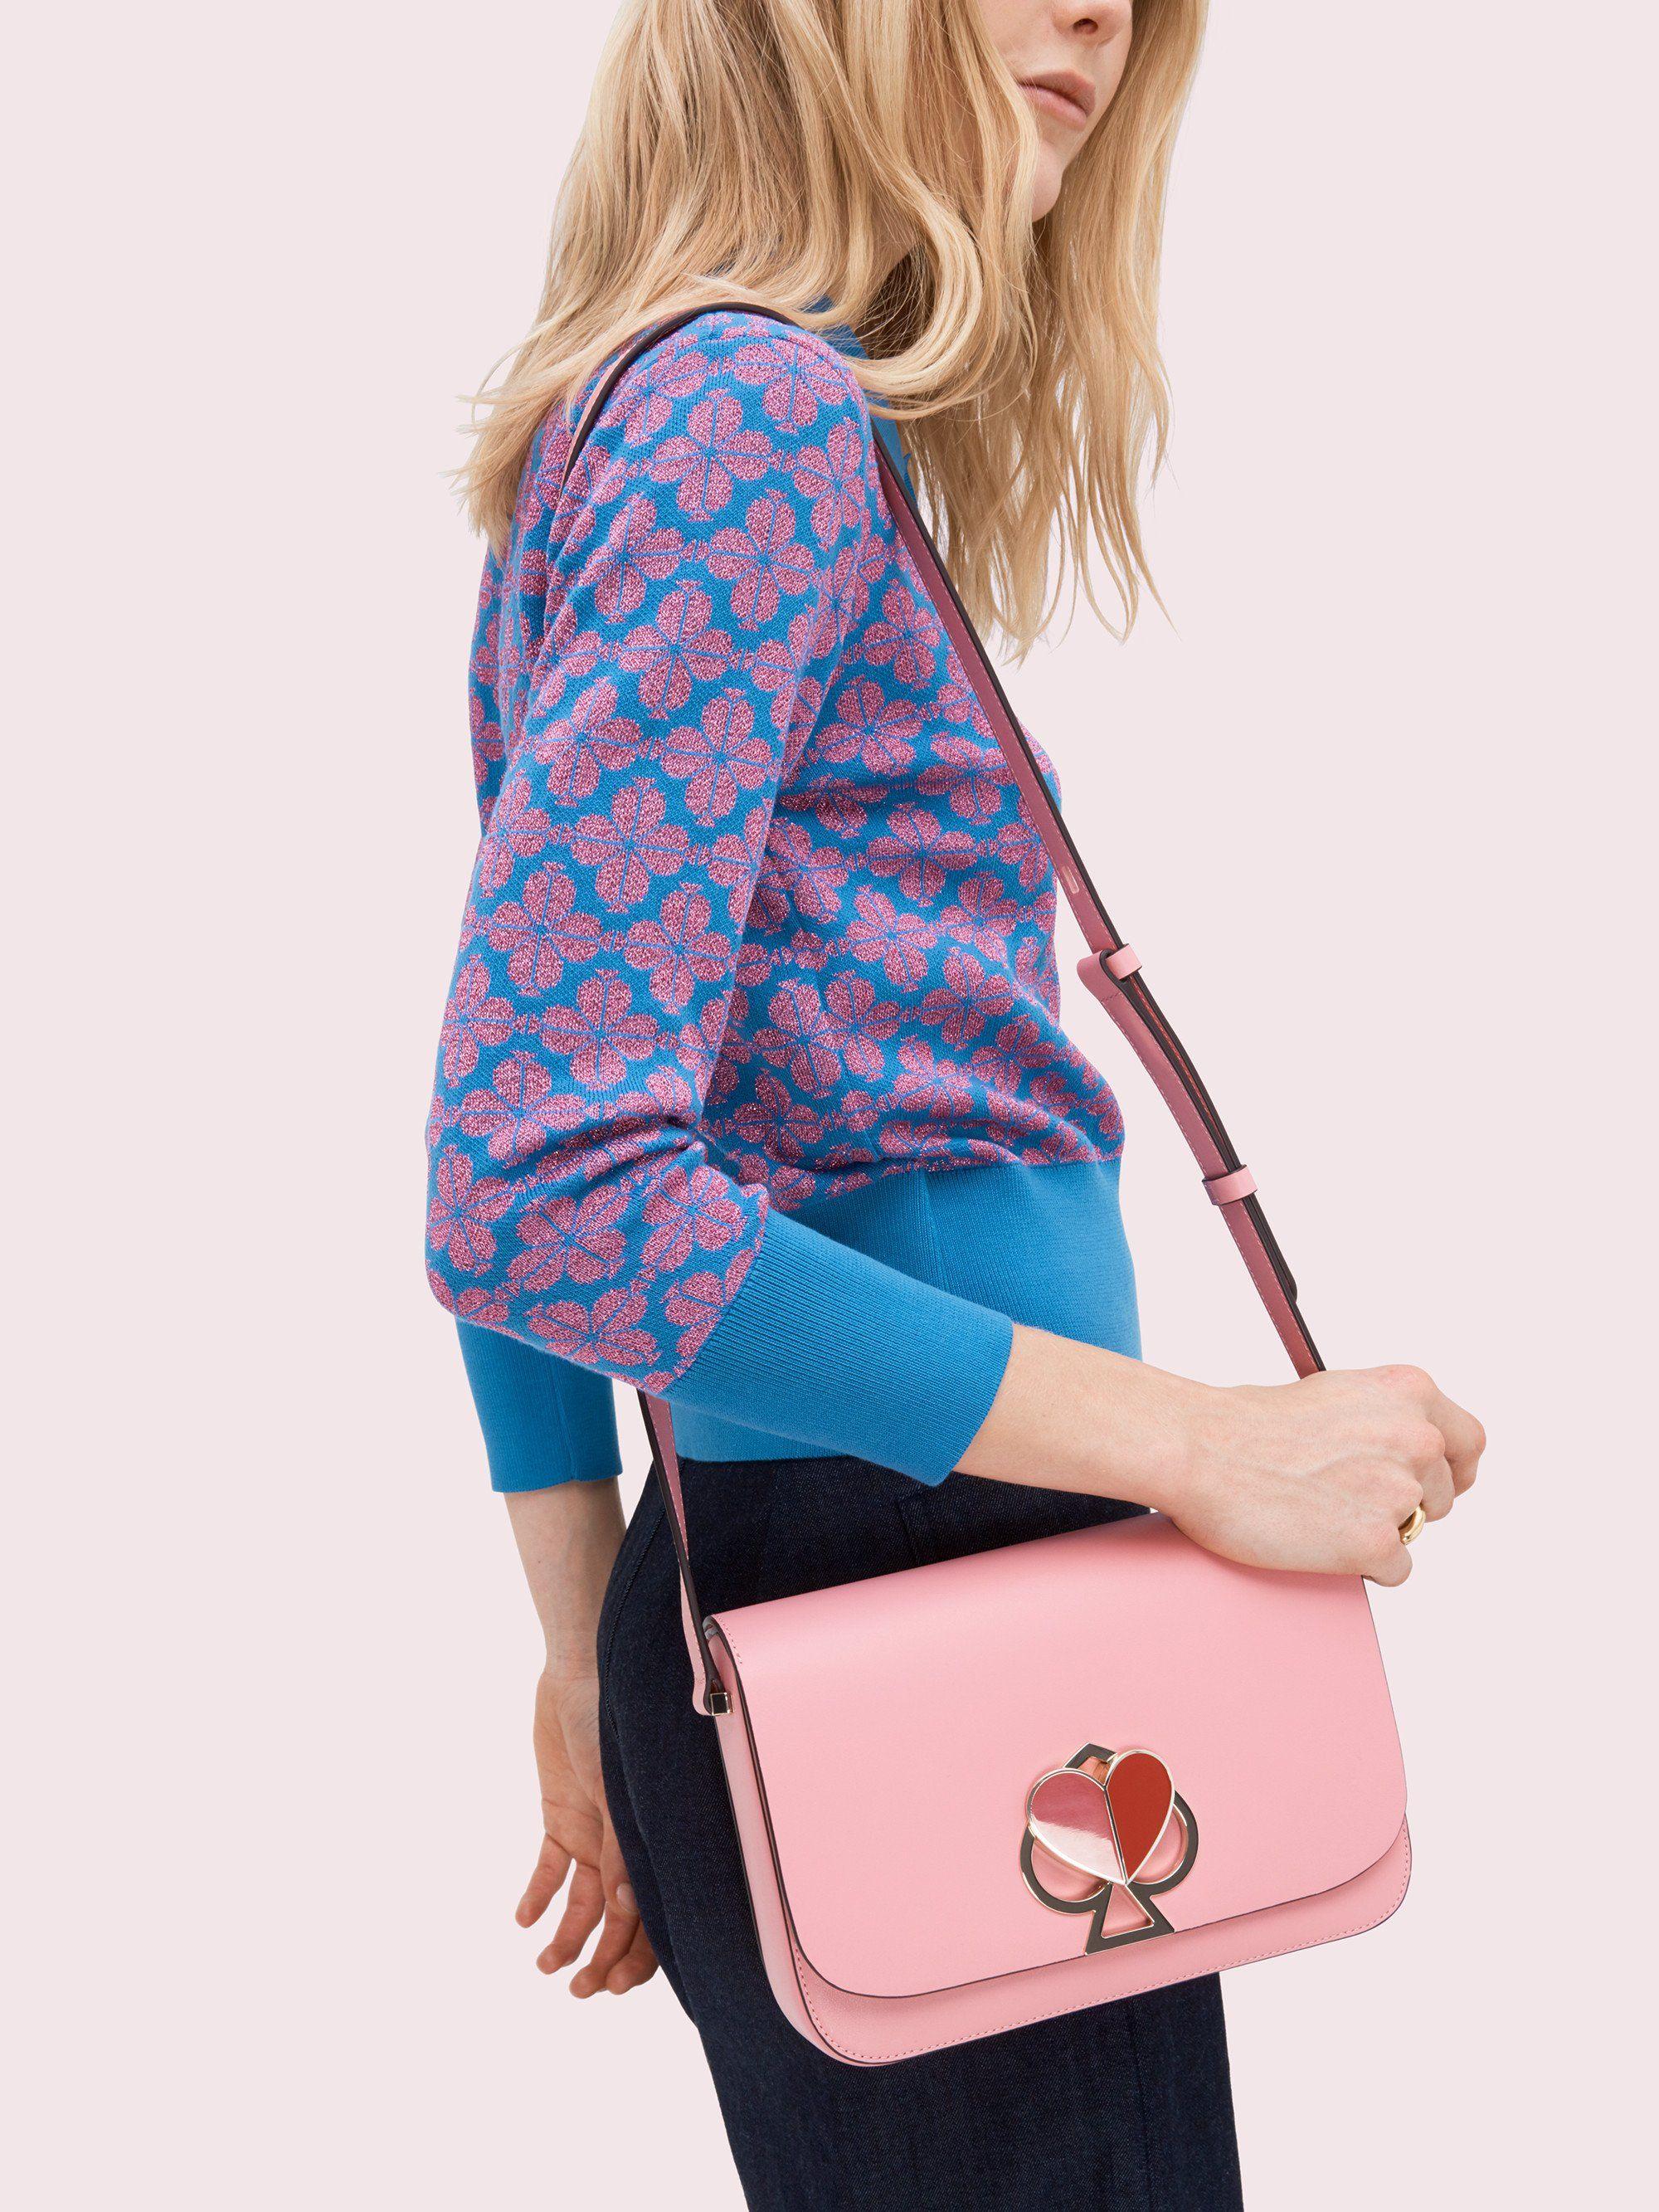 4d2498c4d03 Nicola twistlock medium shoulder bag in 2019 | Bag-a-holic | Bags ...